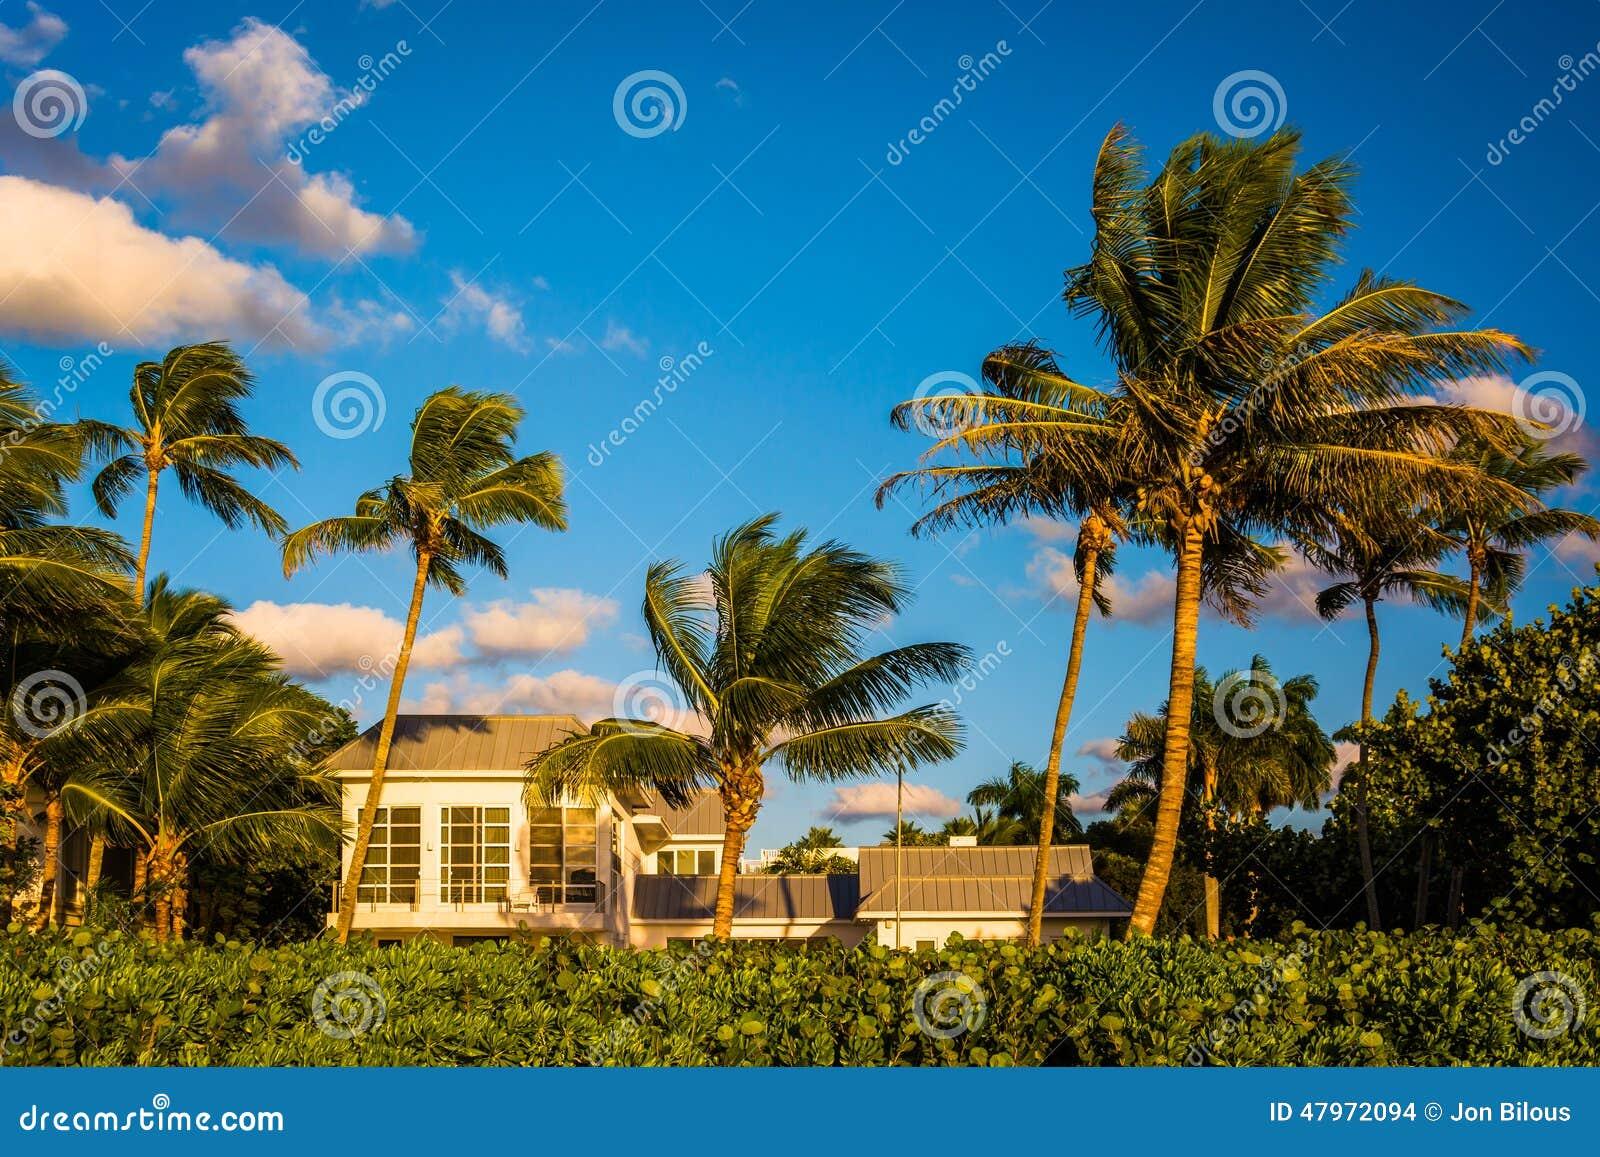 Palm Beach Florida House Prices